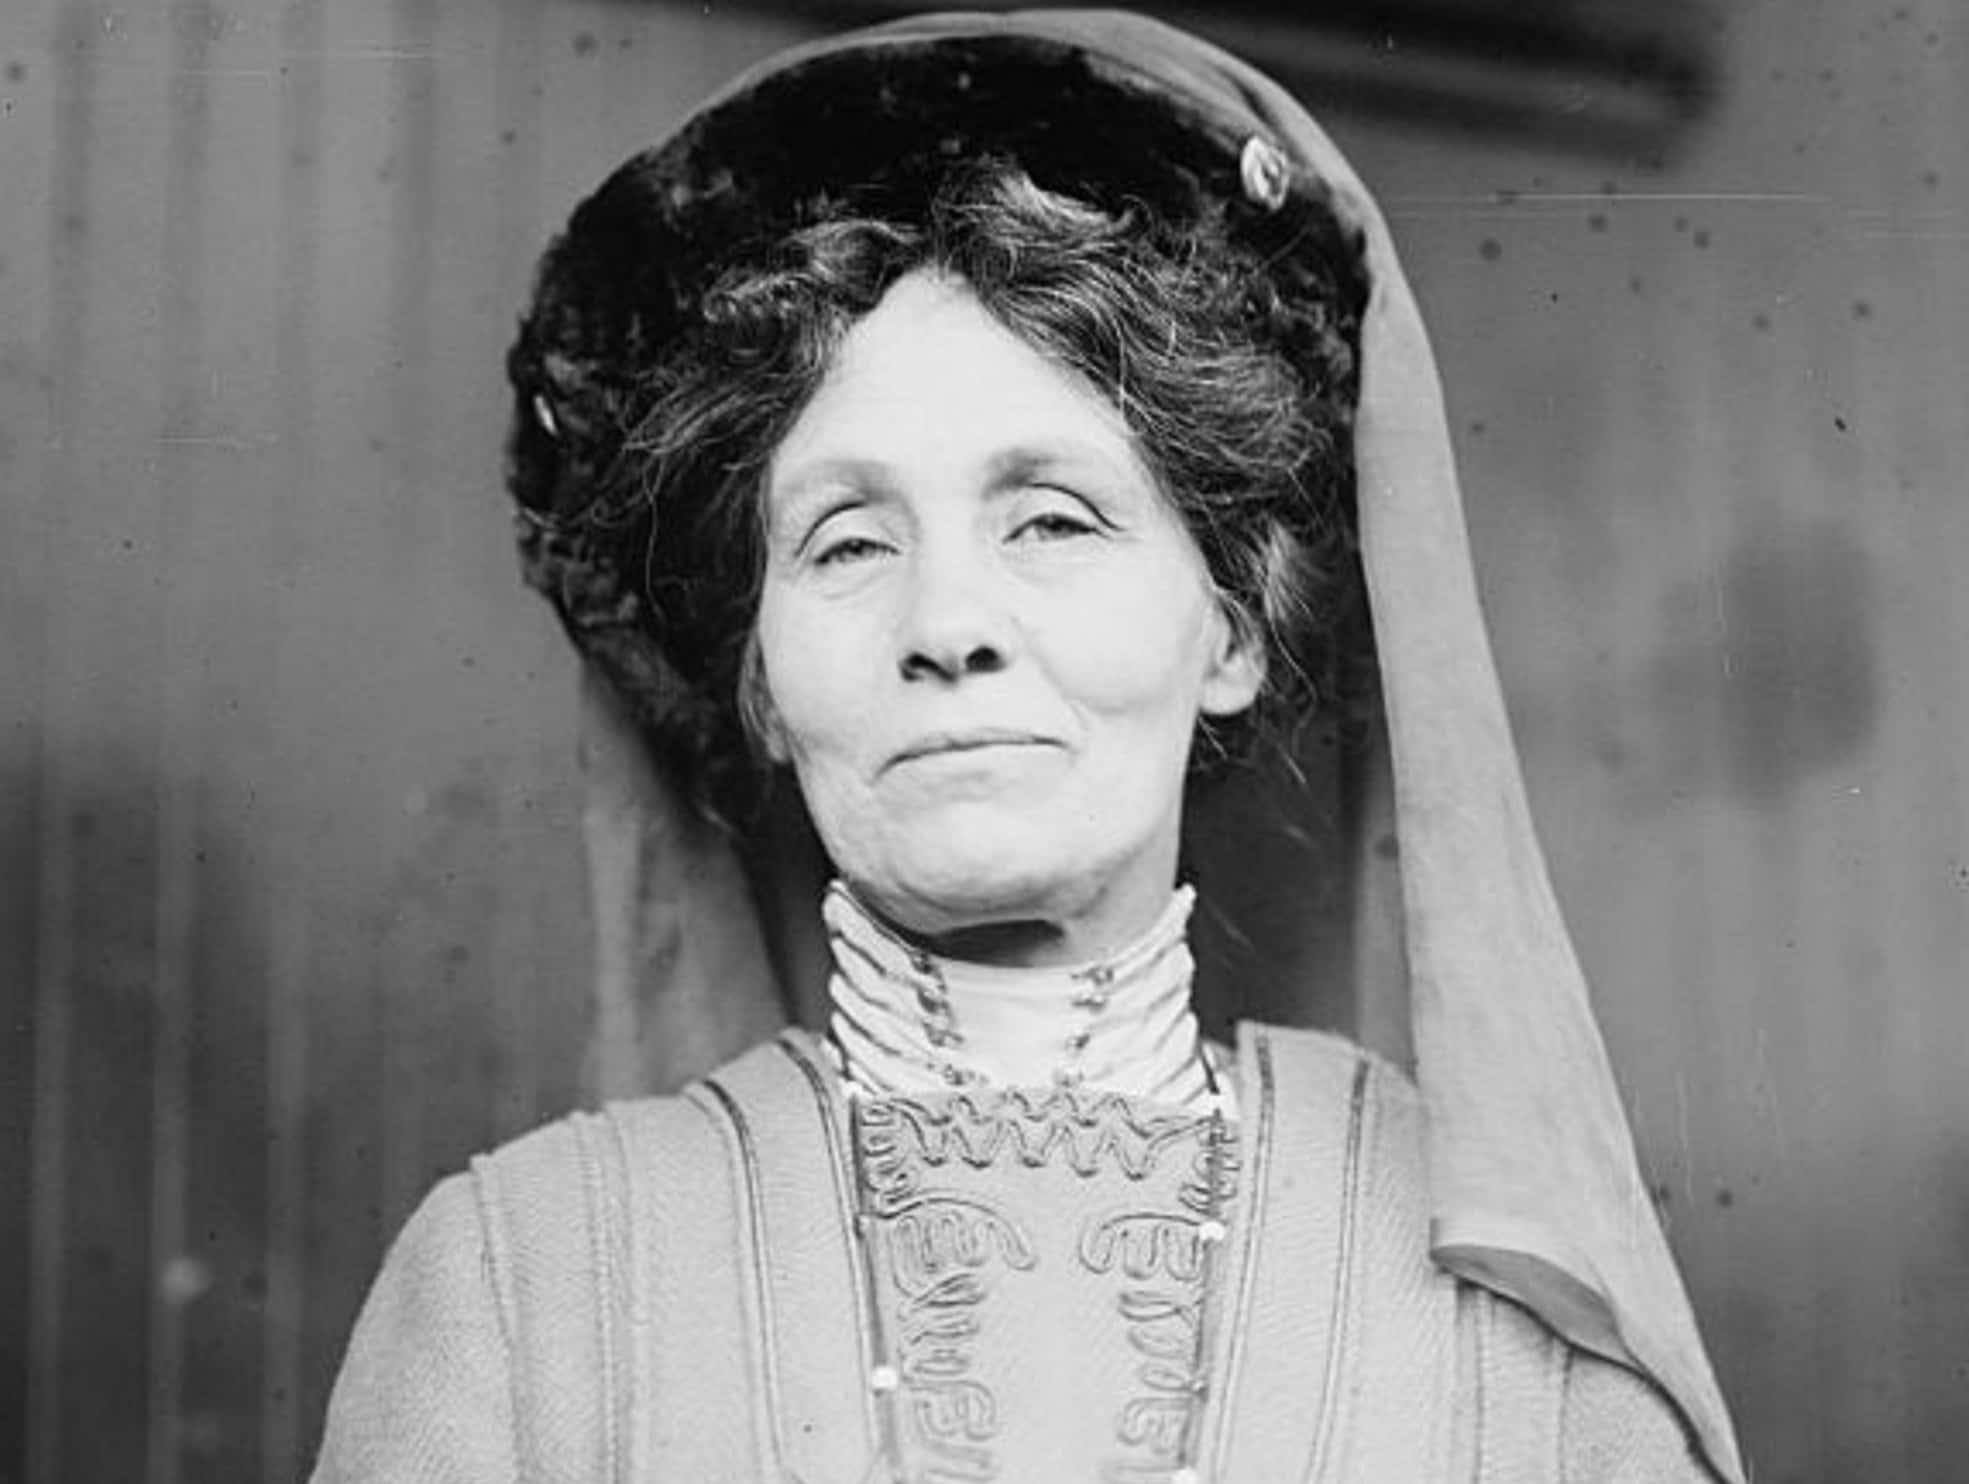 Emmeline Pankhurst facts